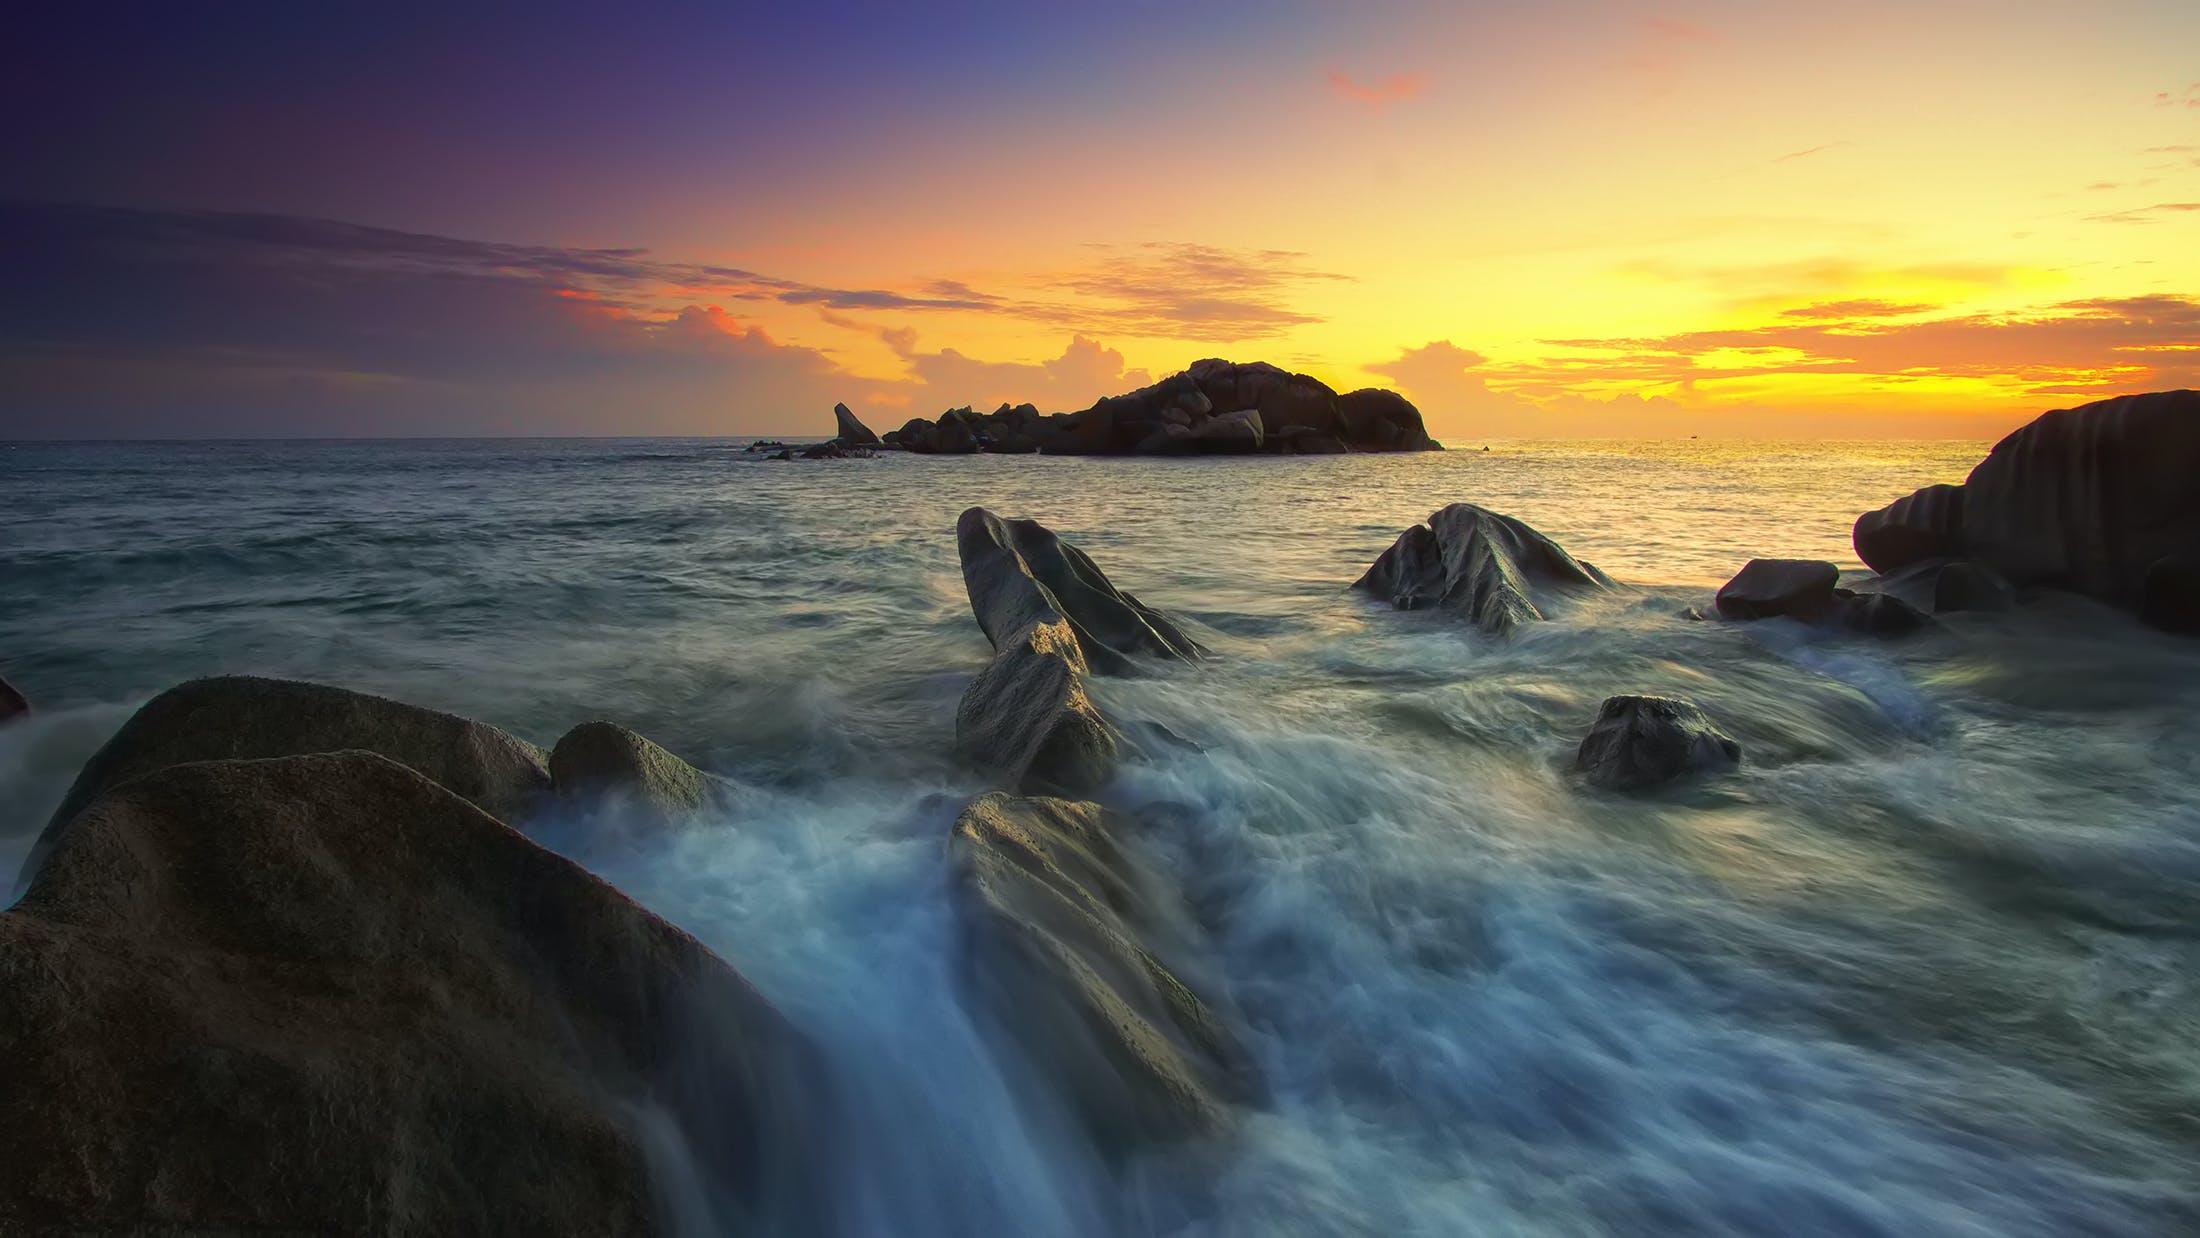 Seashore during Sunsset